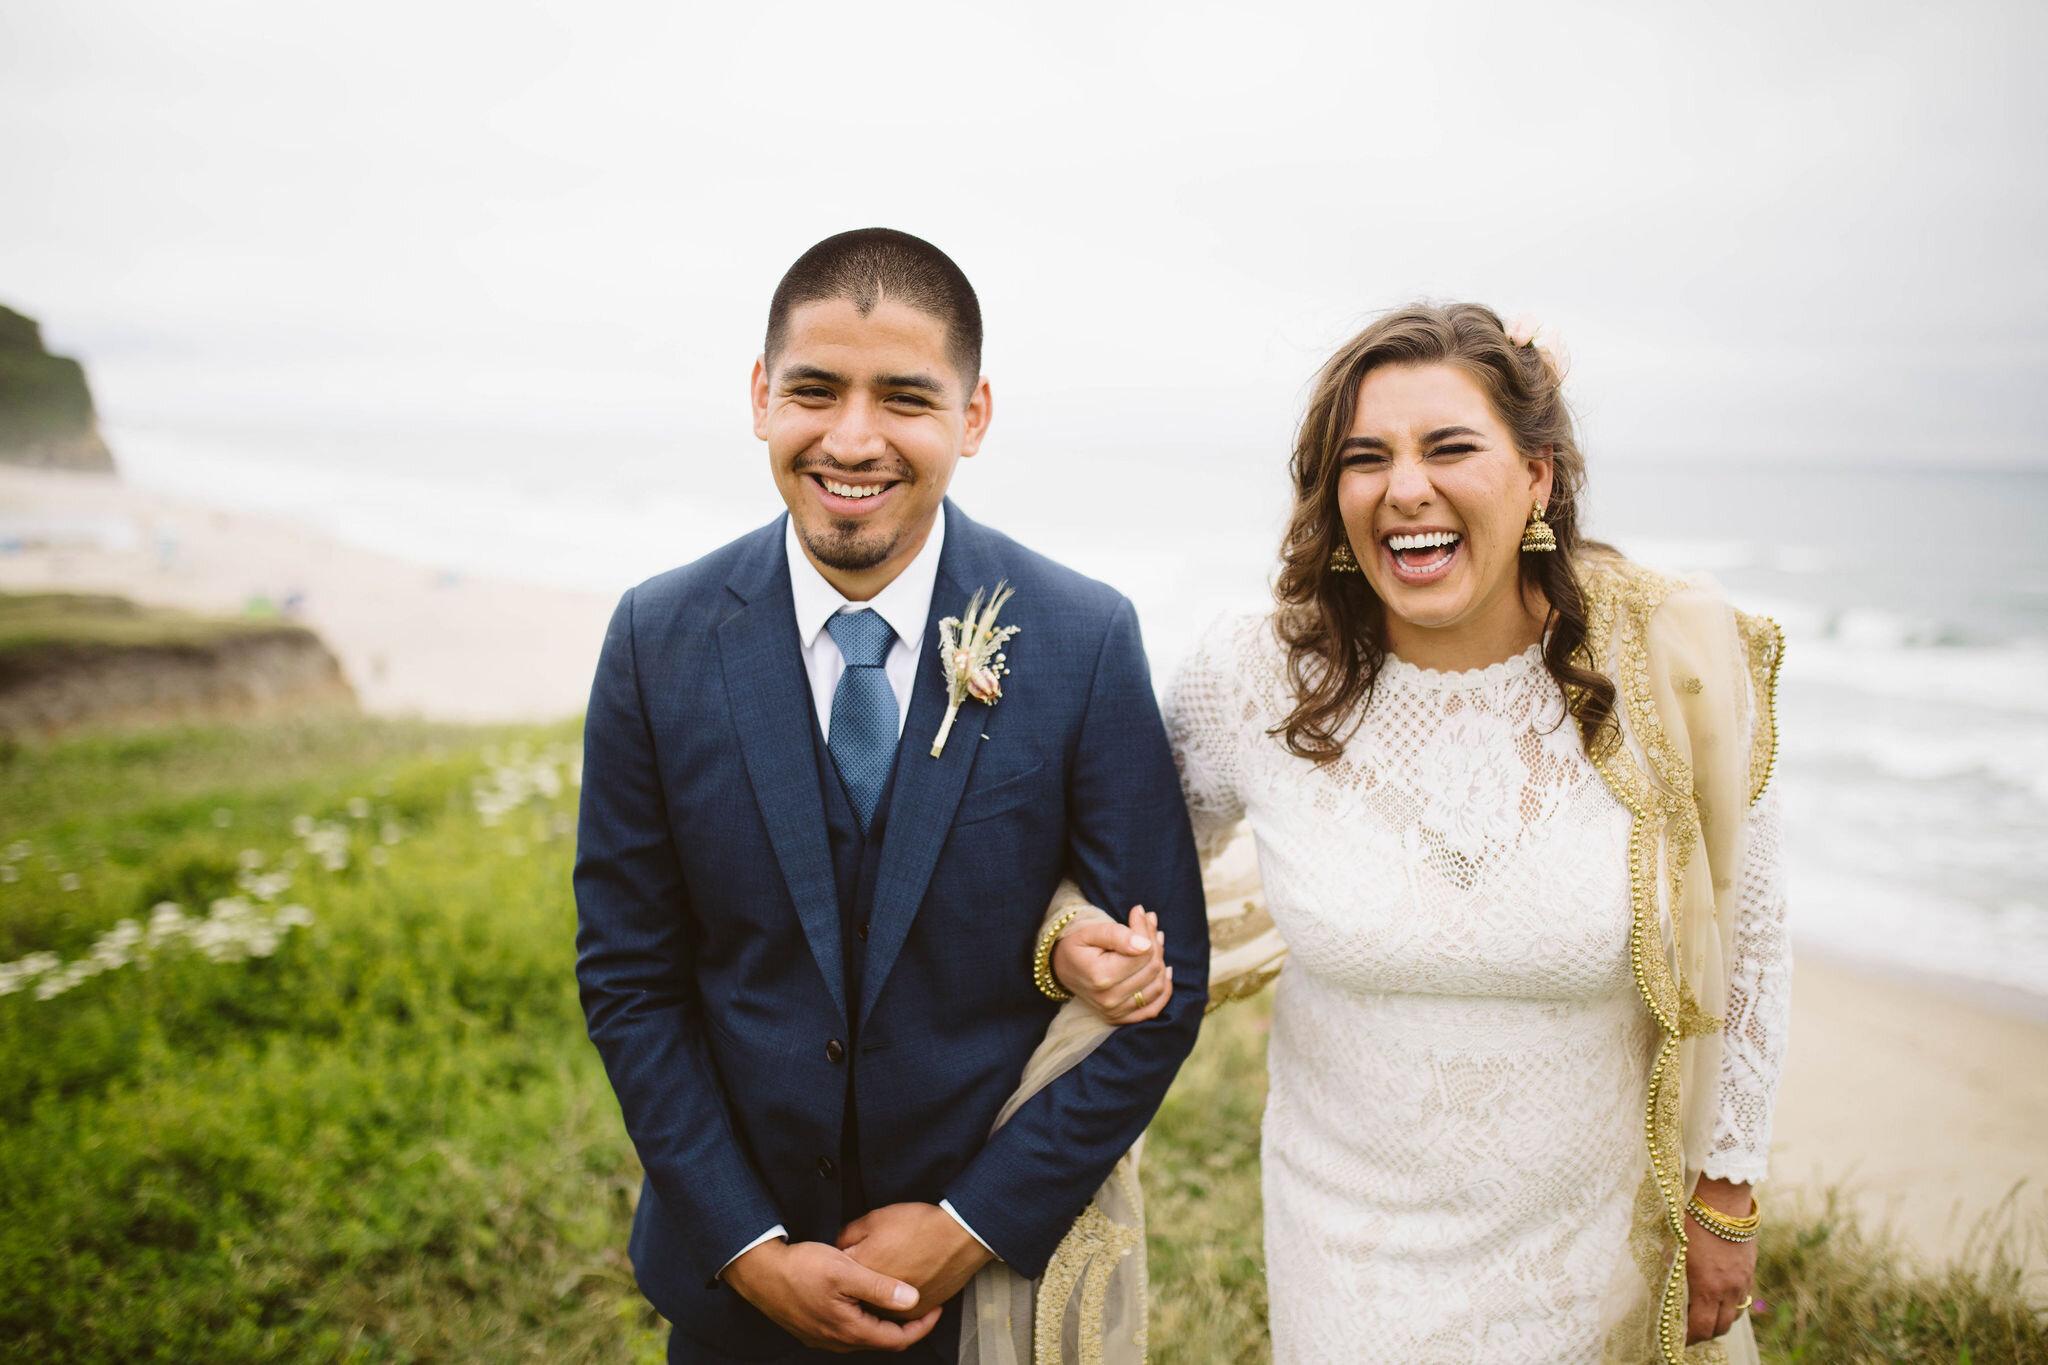 Venture-Retreat-Center-Wedding-Pescadero-Sat-Aaron-Pritam-The-Shalom-Imaginative-445.jpg